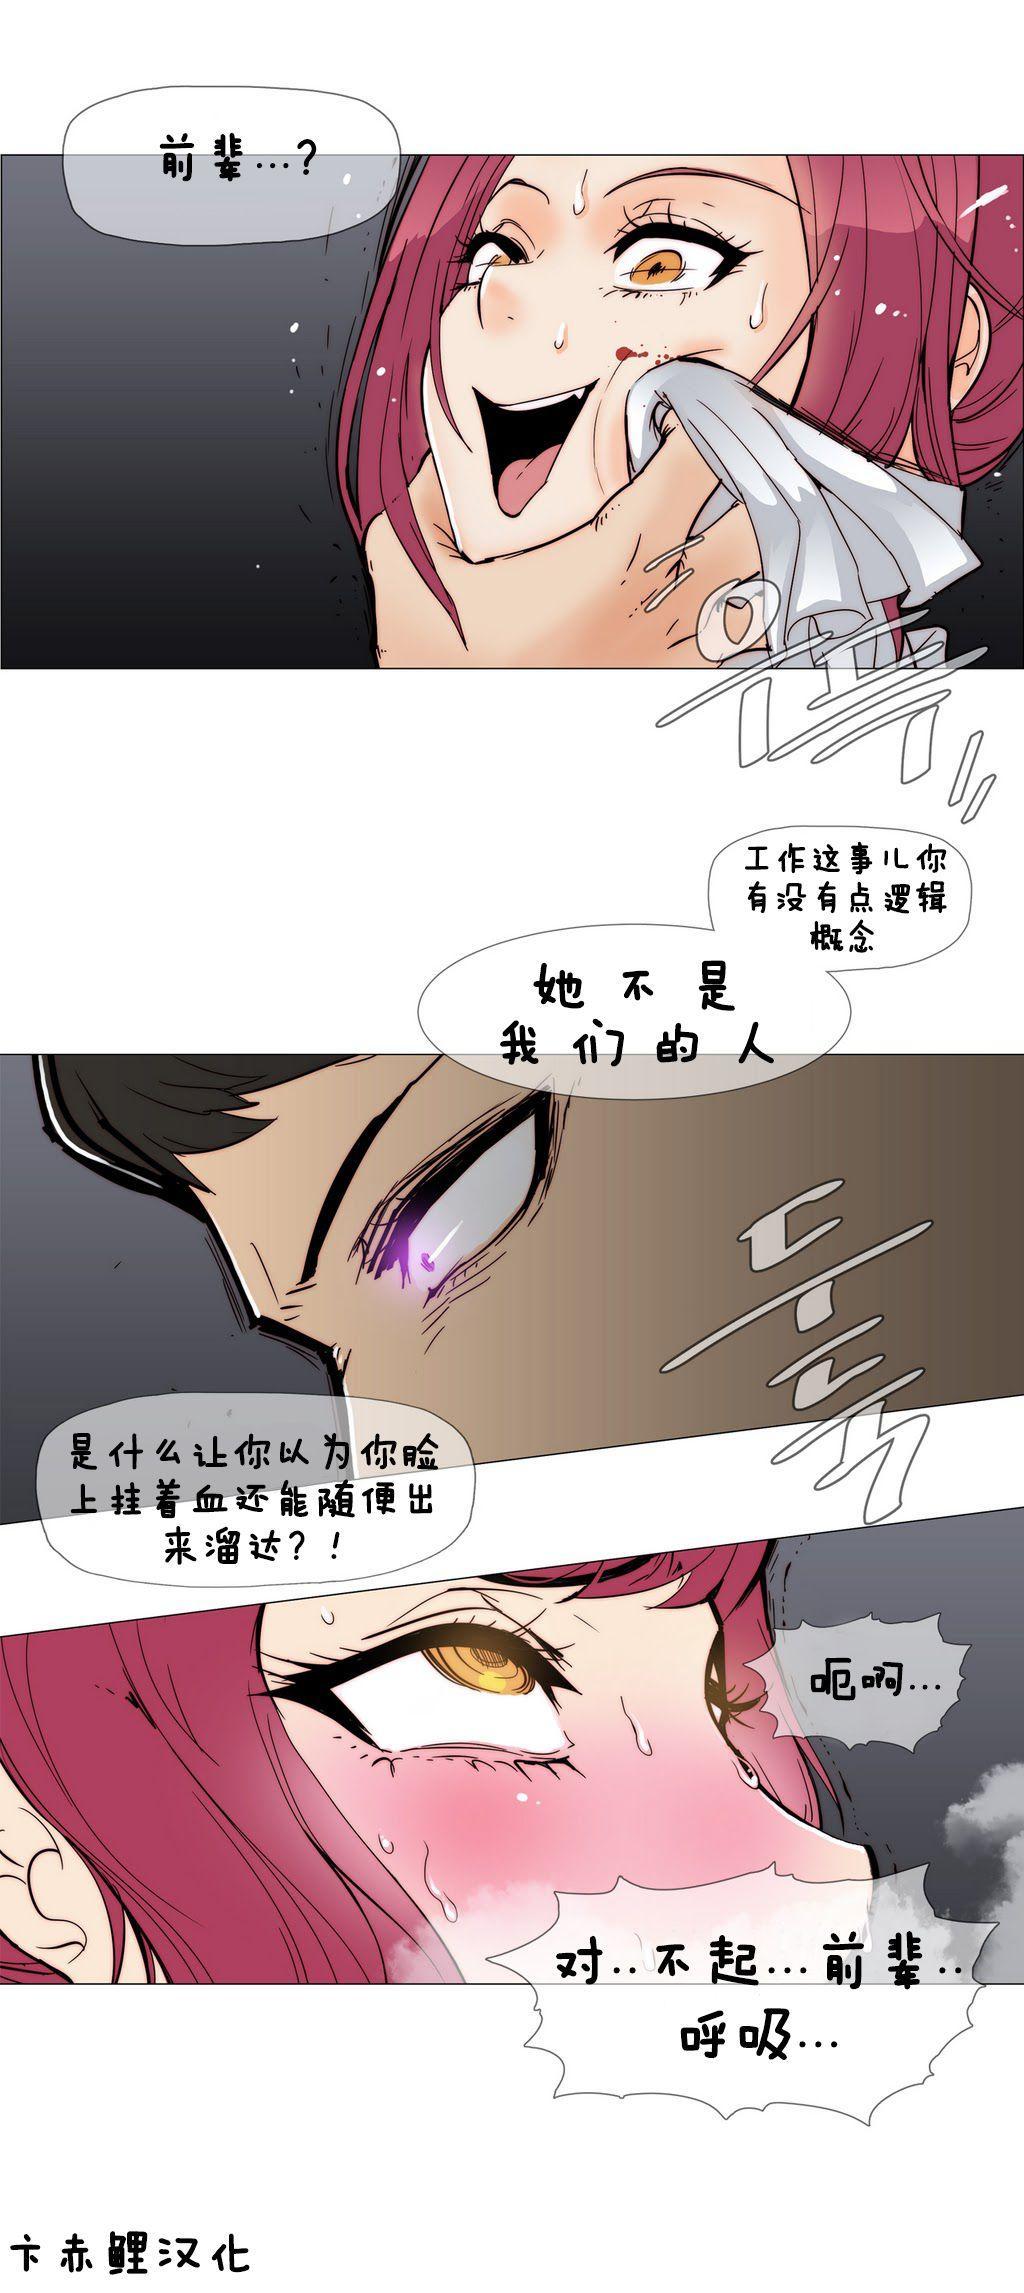 HouseHold Affairs 【卞赤鲤个人汉化】1~21话(持续更新中) 94